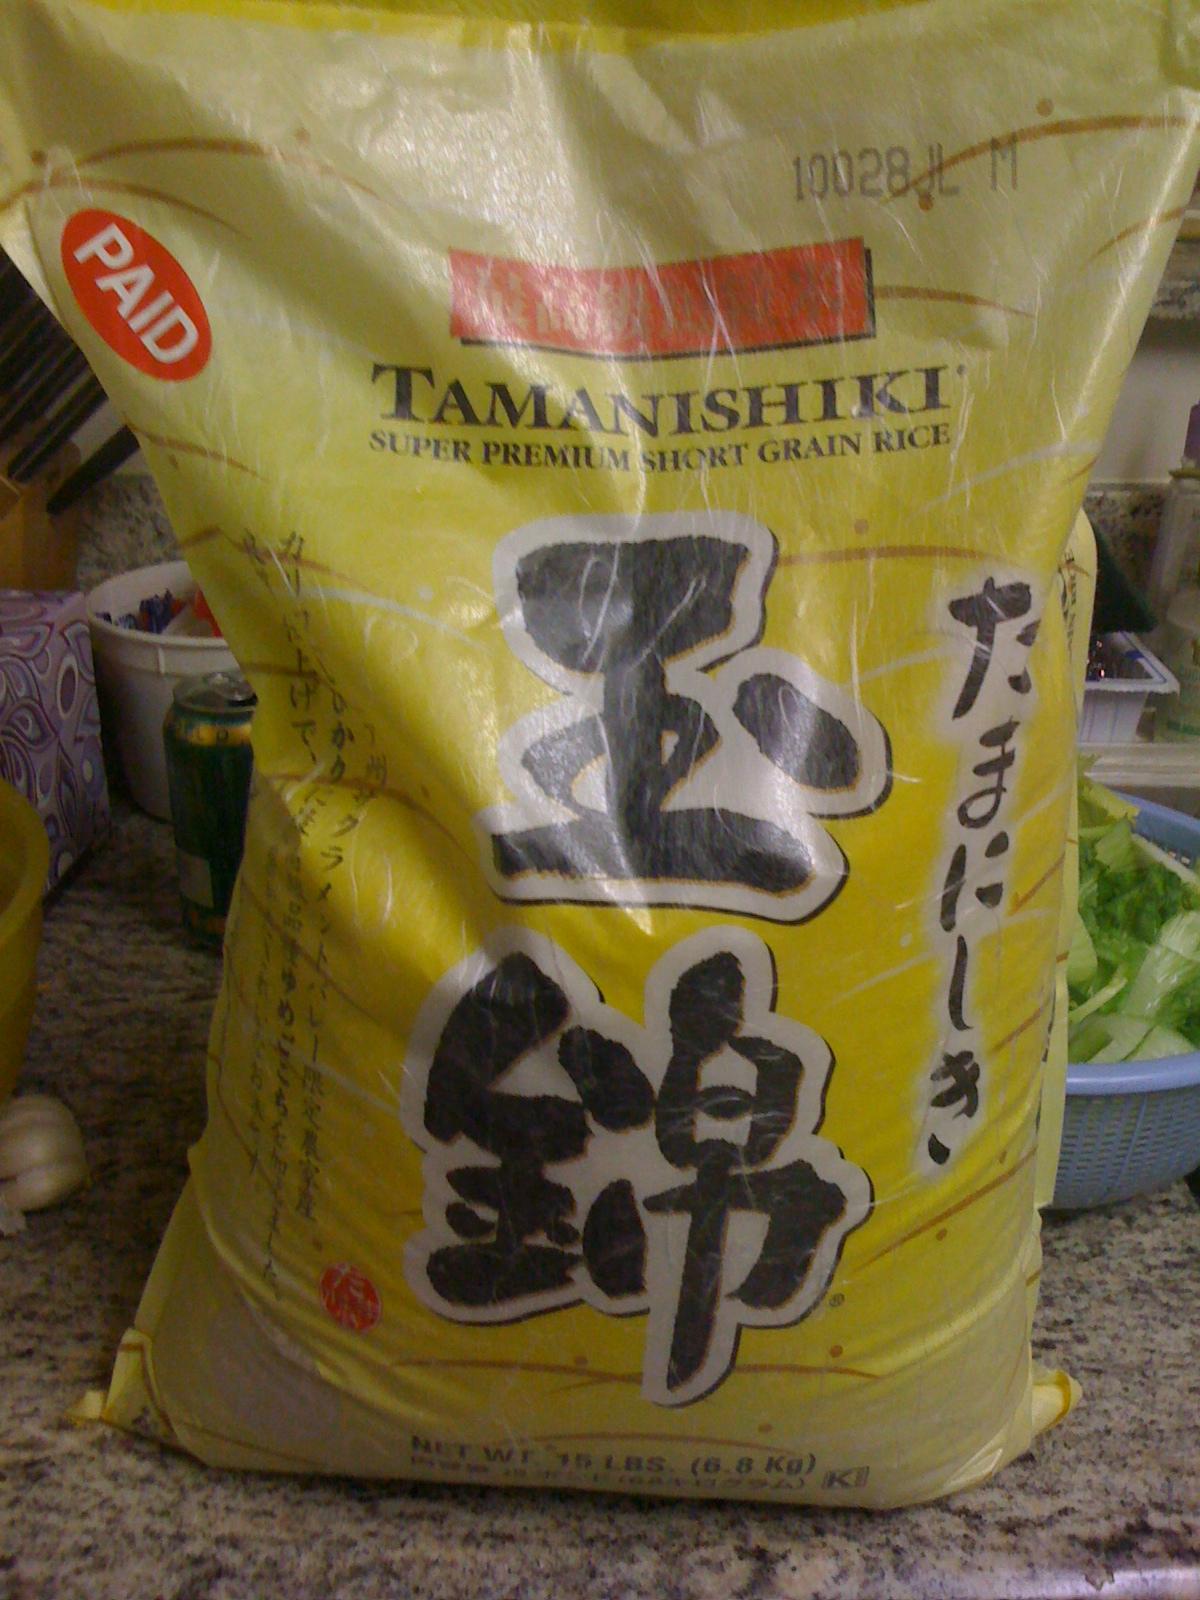 T's Rice Reviews: Tamanishiki Super Premium Short Grain Rice